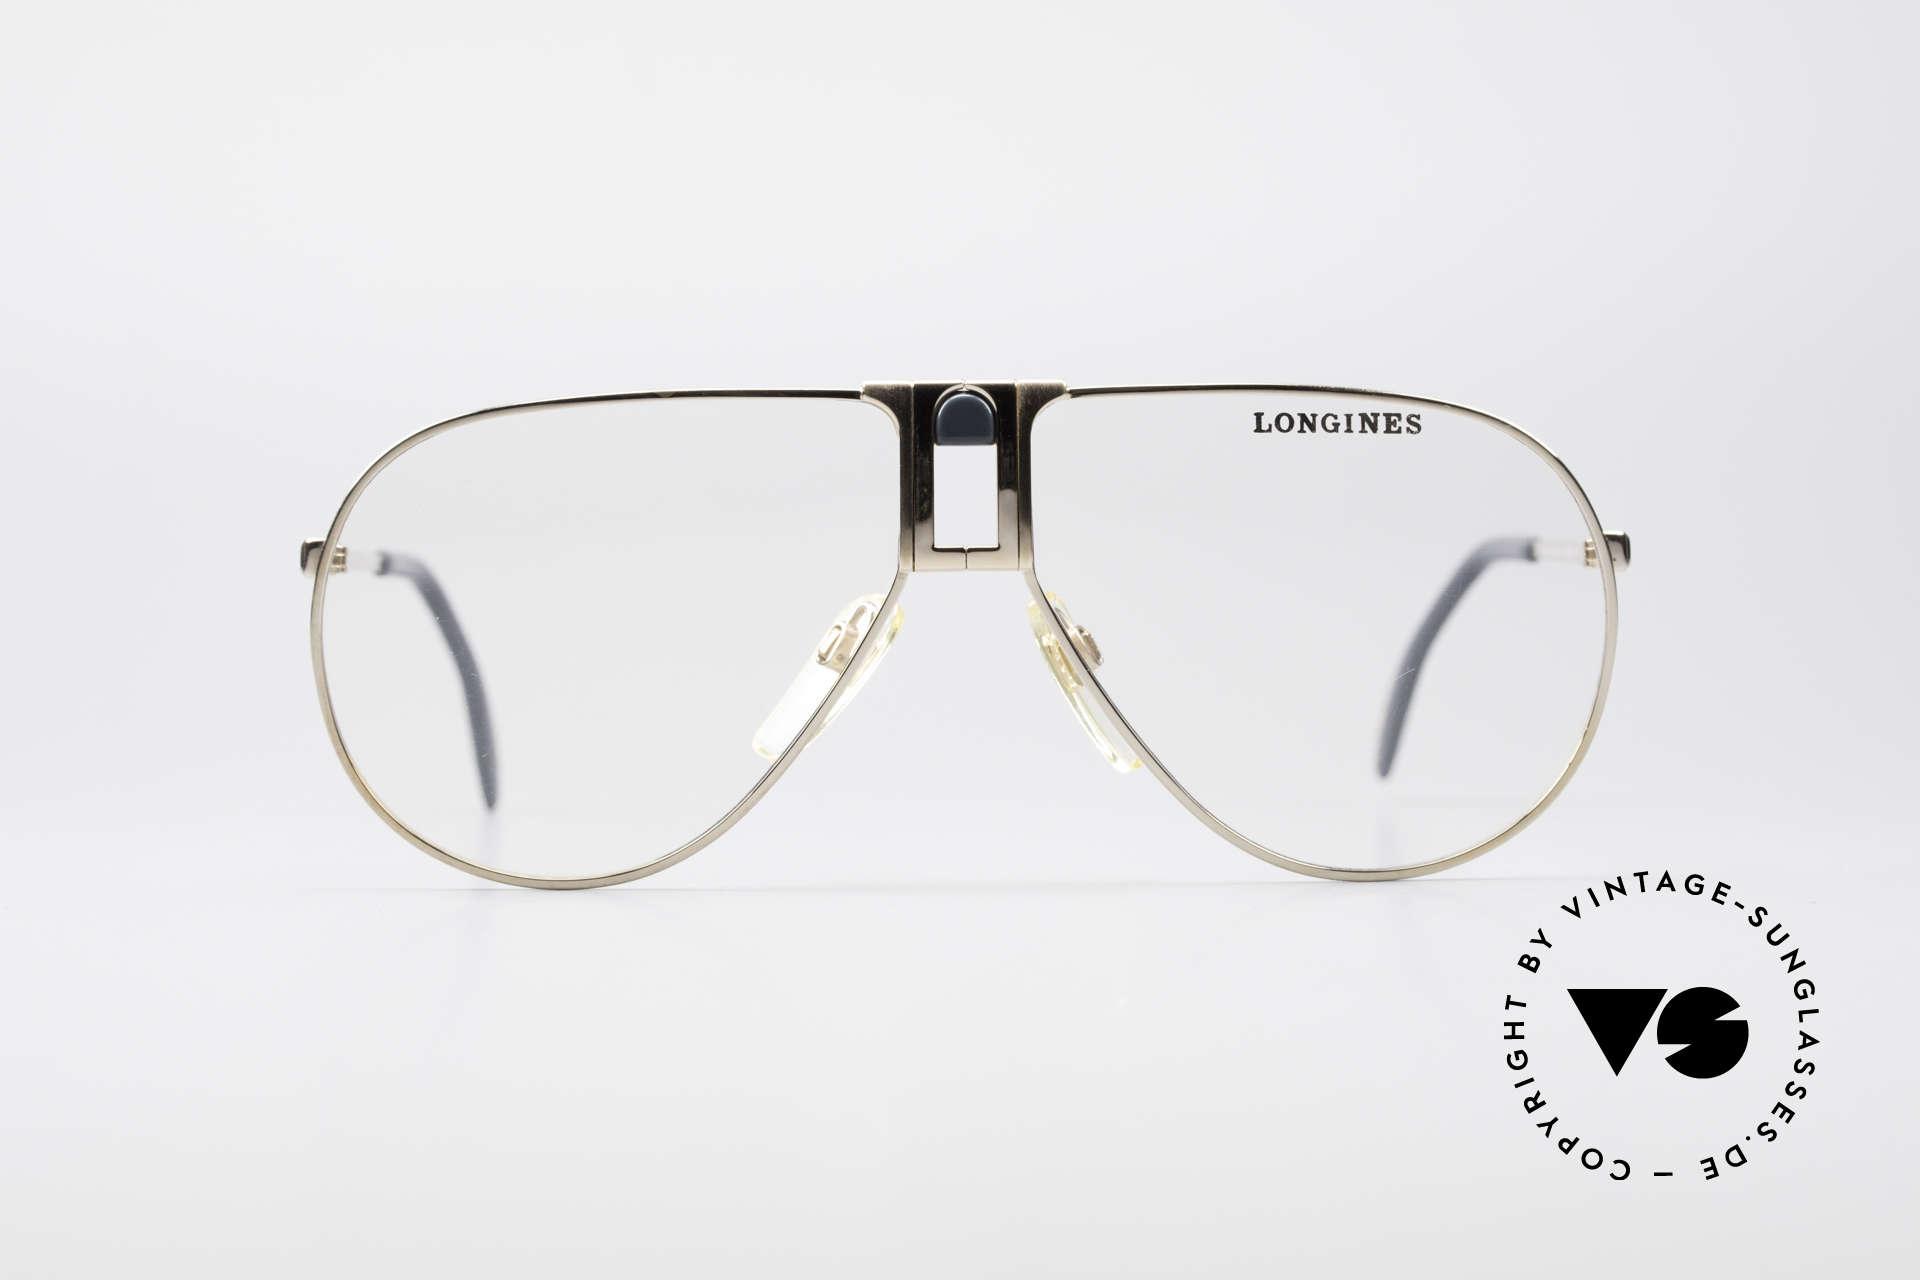 Longines 0154 1980's Aviator Eyeglasses, precious frame with spring hinges (Metzler, Germany), Made for Men